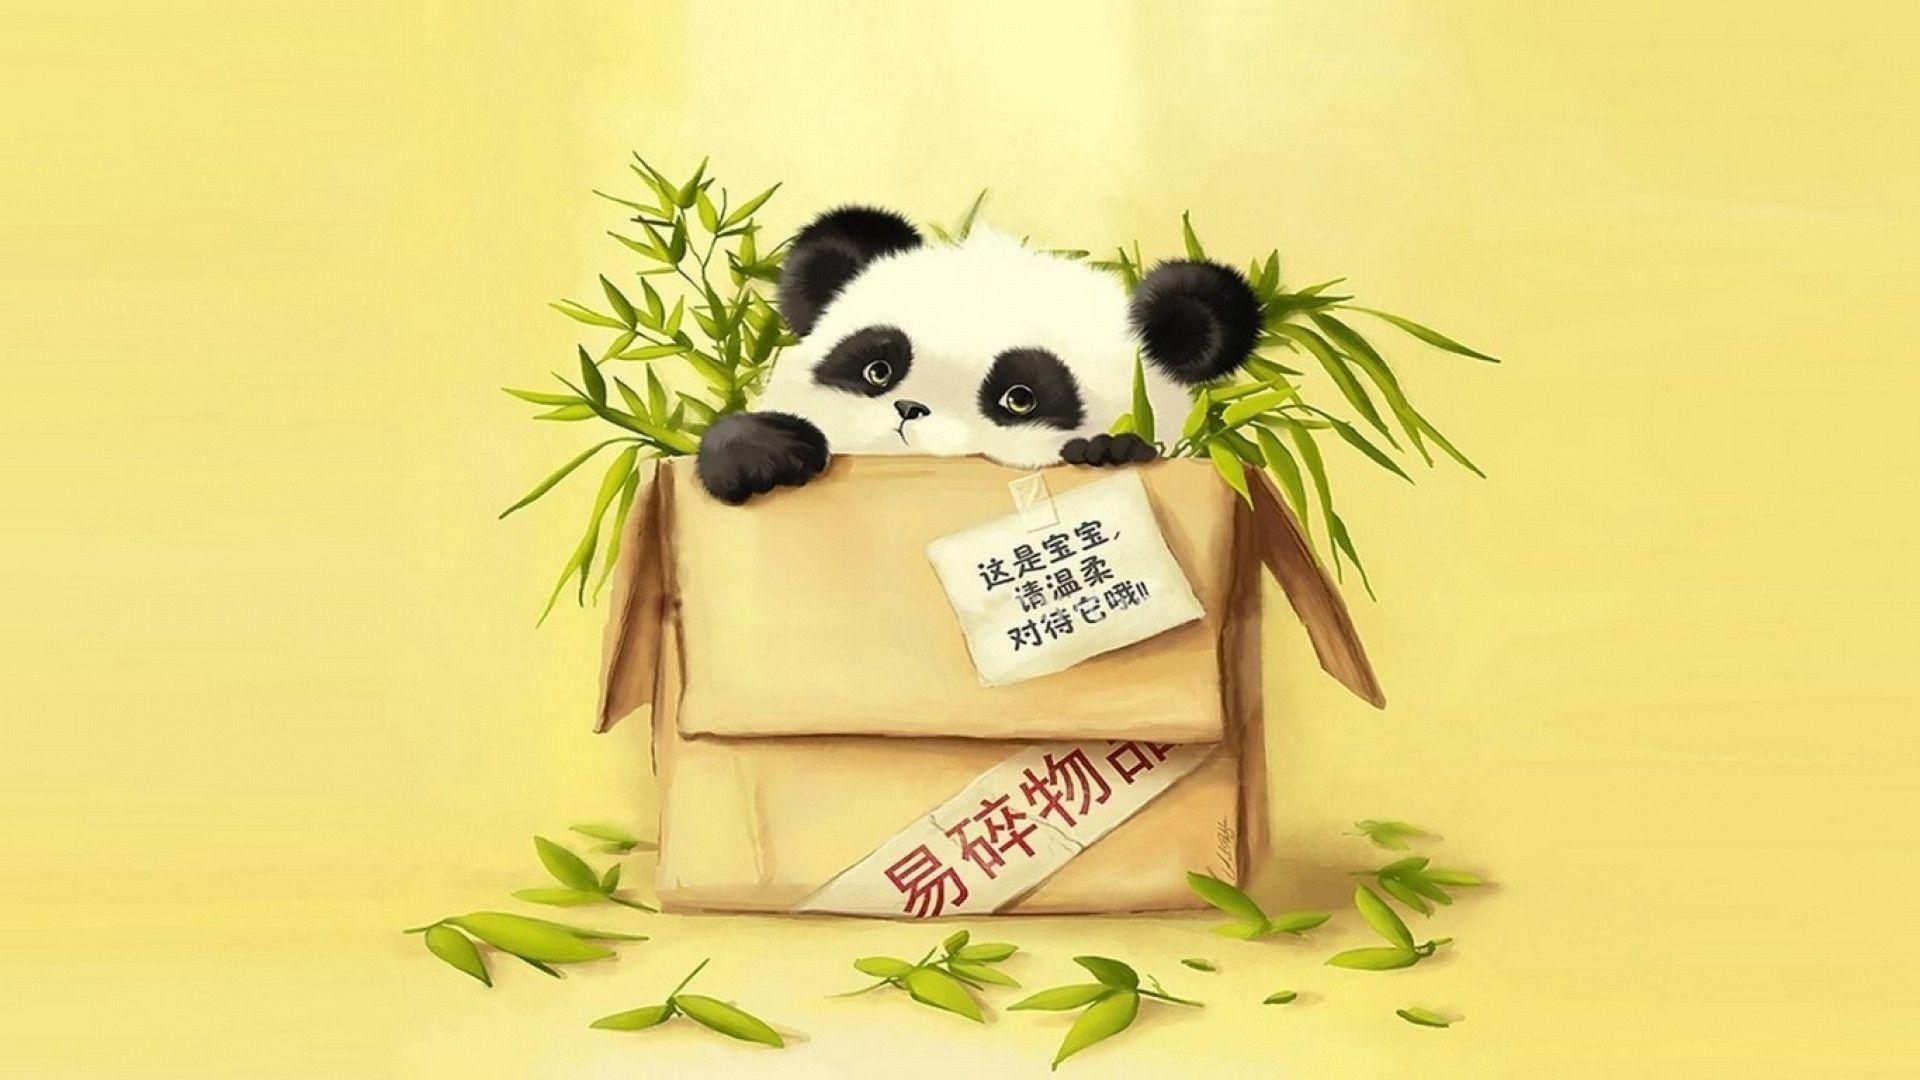 Funny Cartoon Panda Wallpaper – Cartoon Wallpapers (10007) ilikewalls.